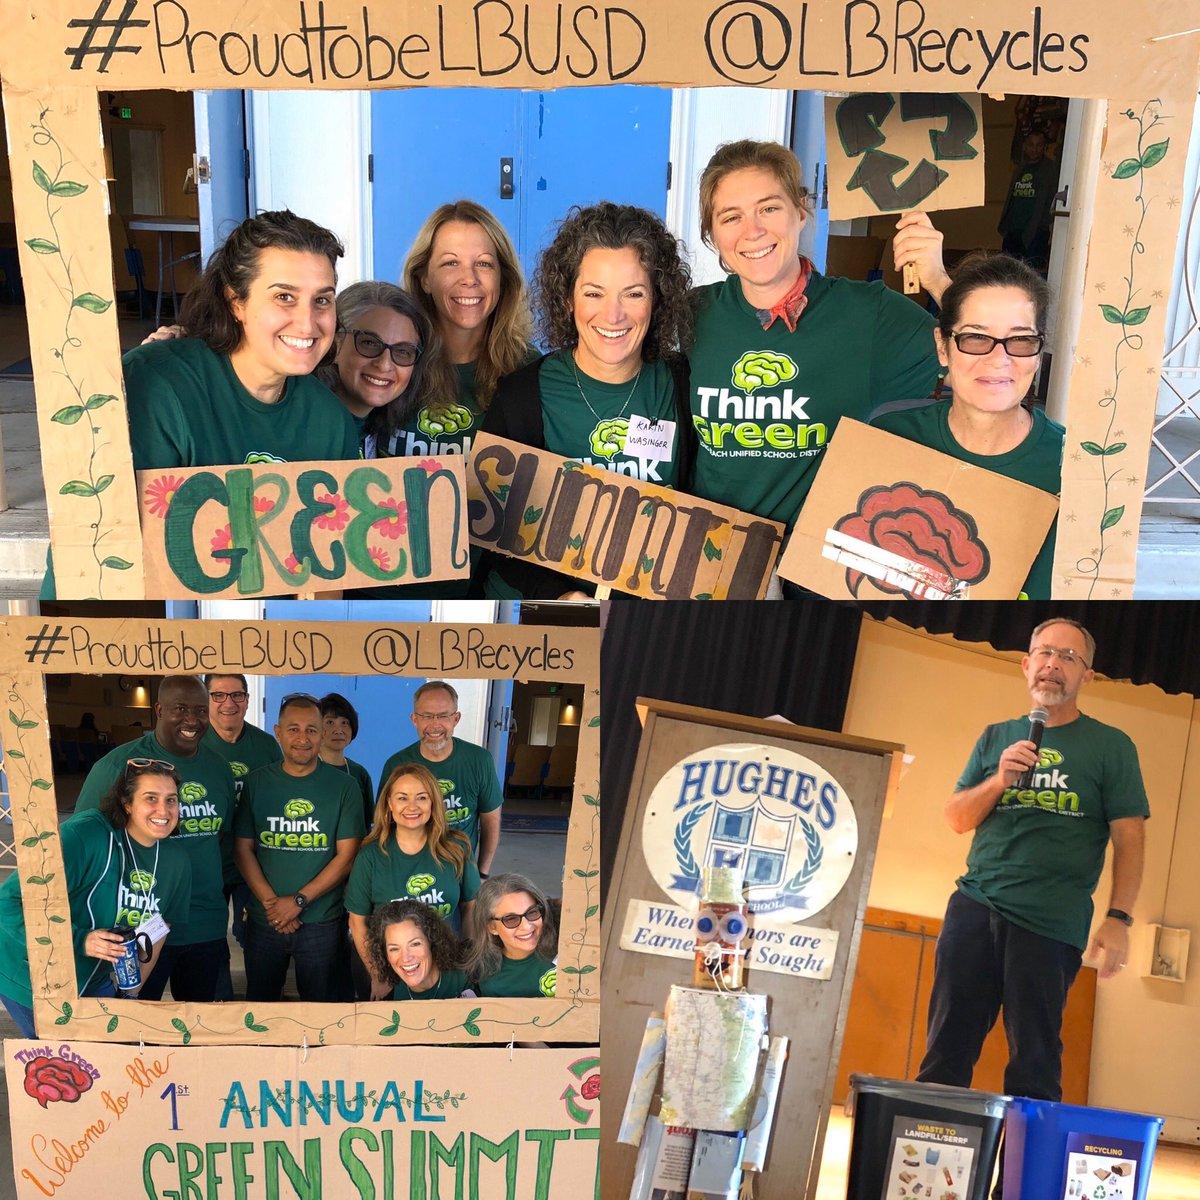 #LBGreenSummit2019 was an incredible success! Thanks to @RogersGreenTeam @SuptSteinhauser, @megankerr, @deesteinberg, @karin_wasinger, @LBSchools, @jbaker000, @Algalita, @GradesofGreen, @HughesOwls, @lucysalazar & 150 of our closest green friends! #proudtobeLBUSD